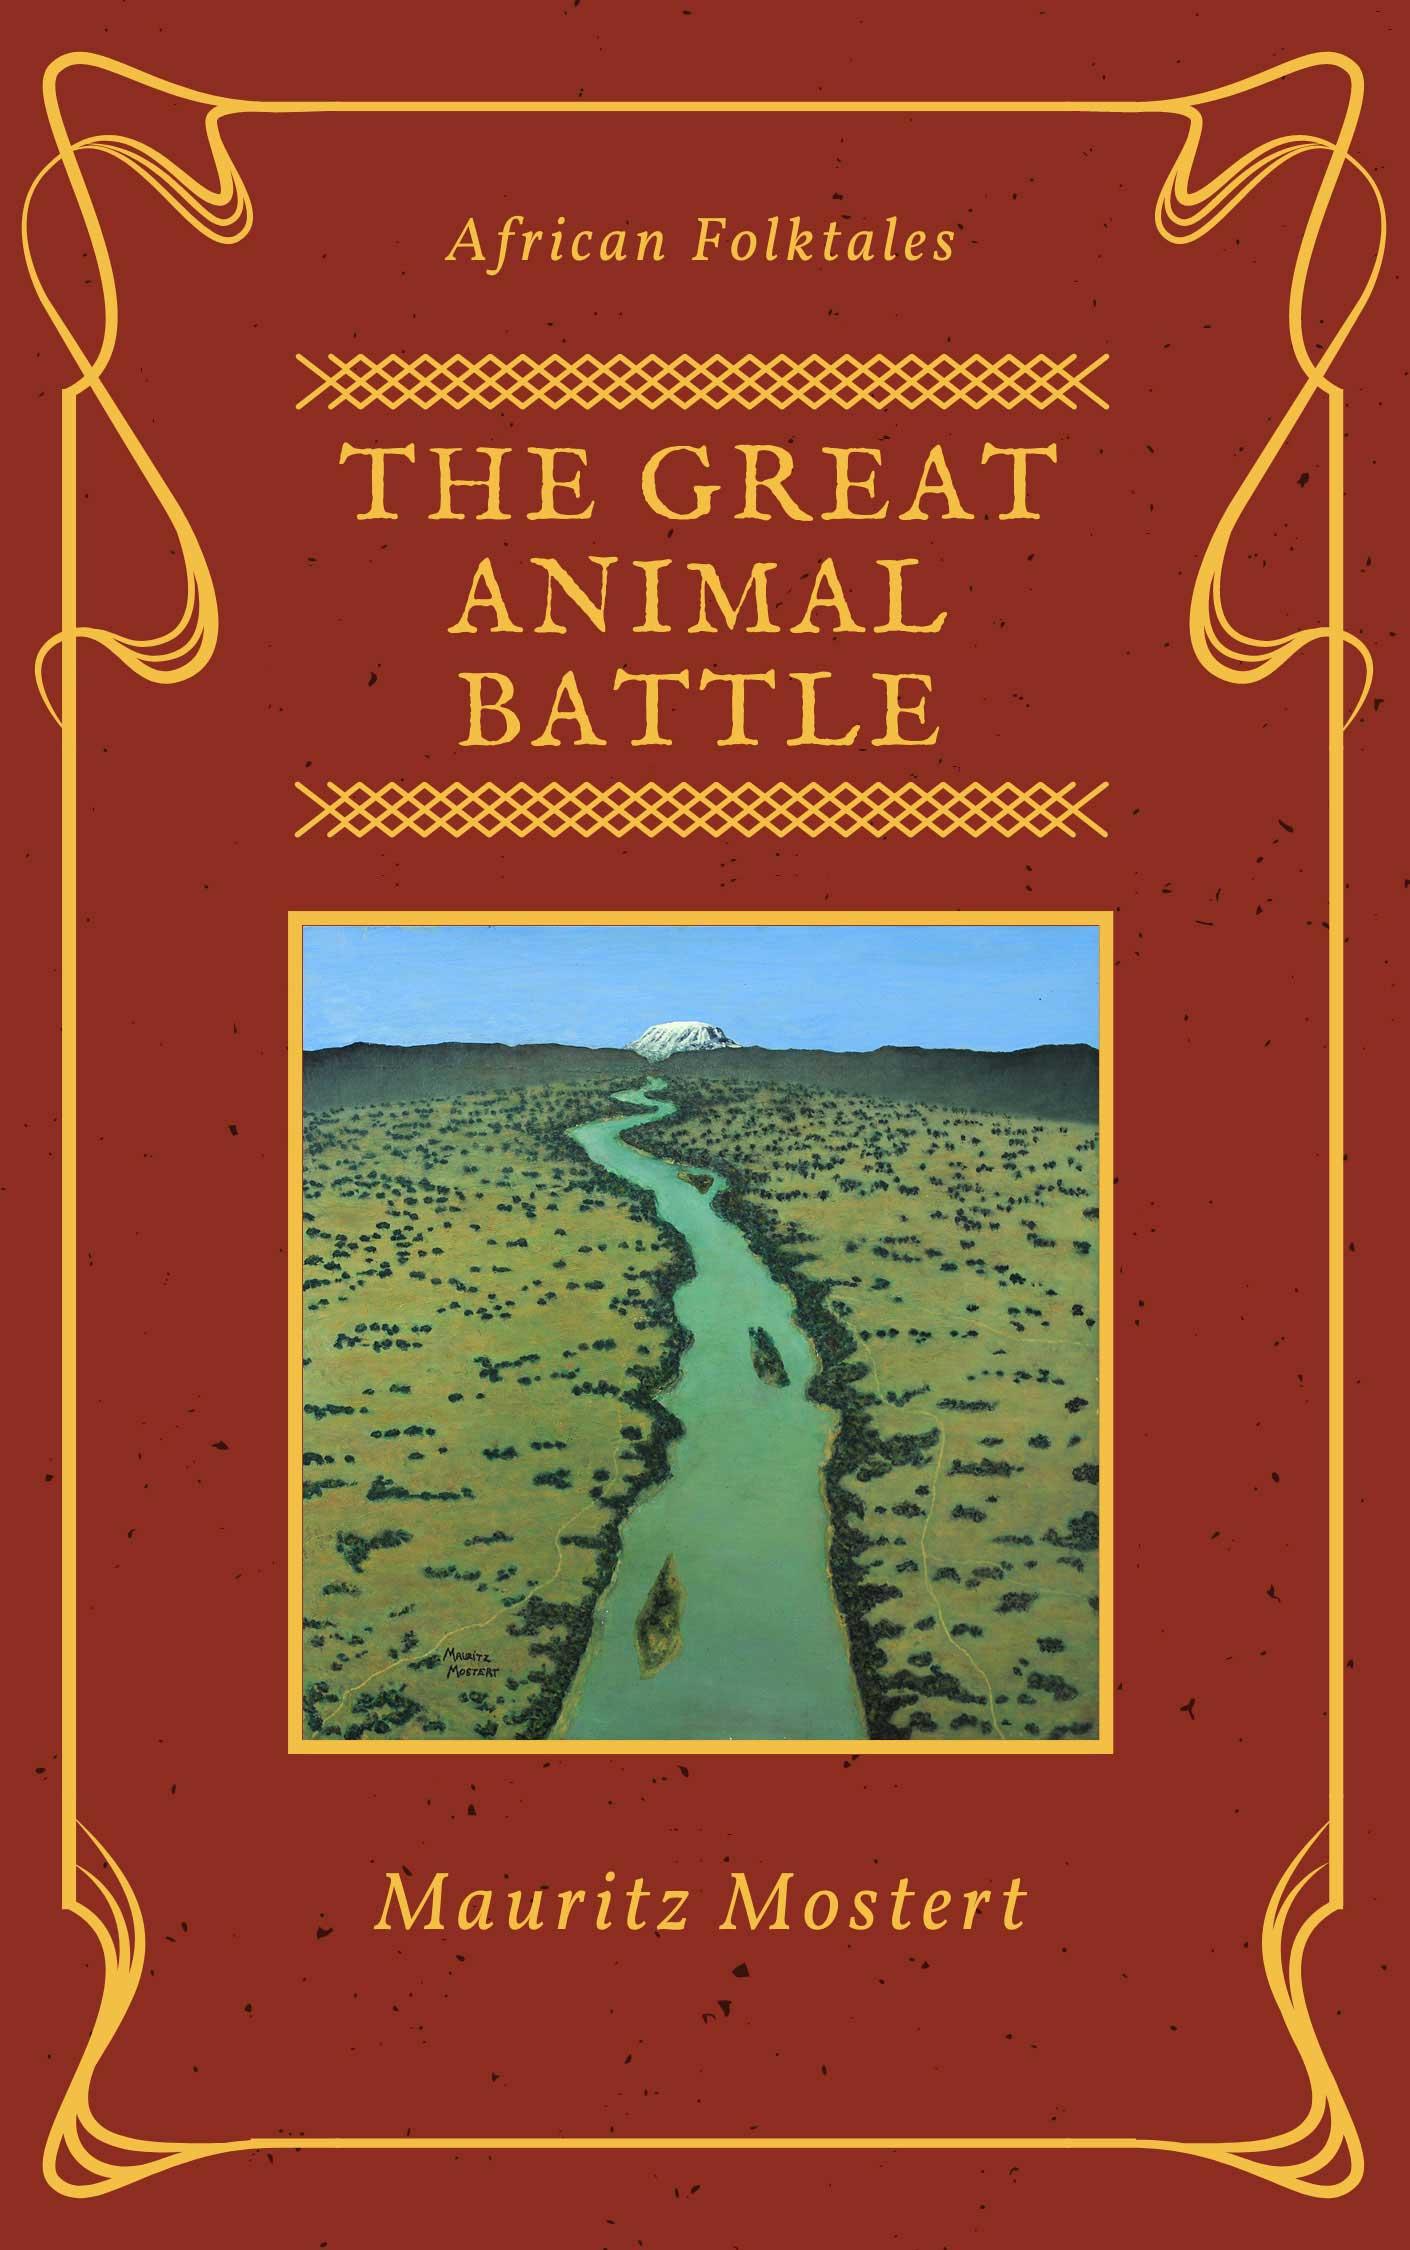 The-Great-Animal-Battle-Wildmoz.com